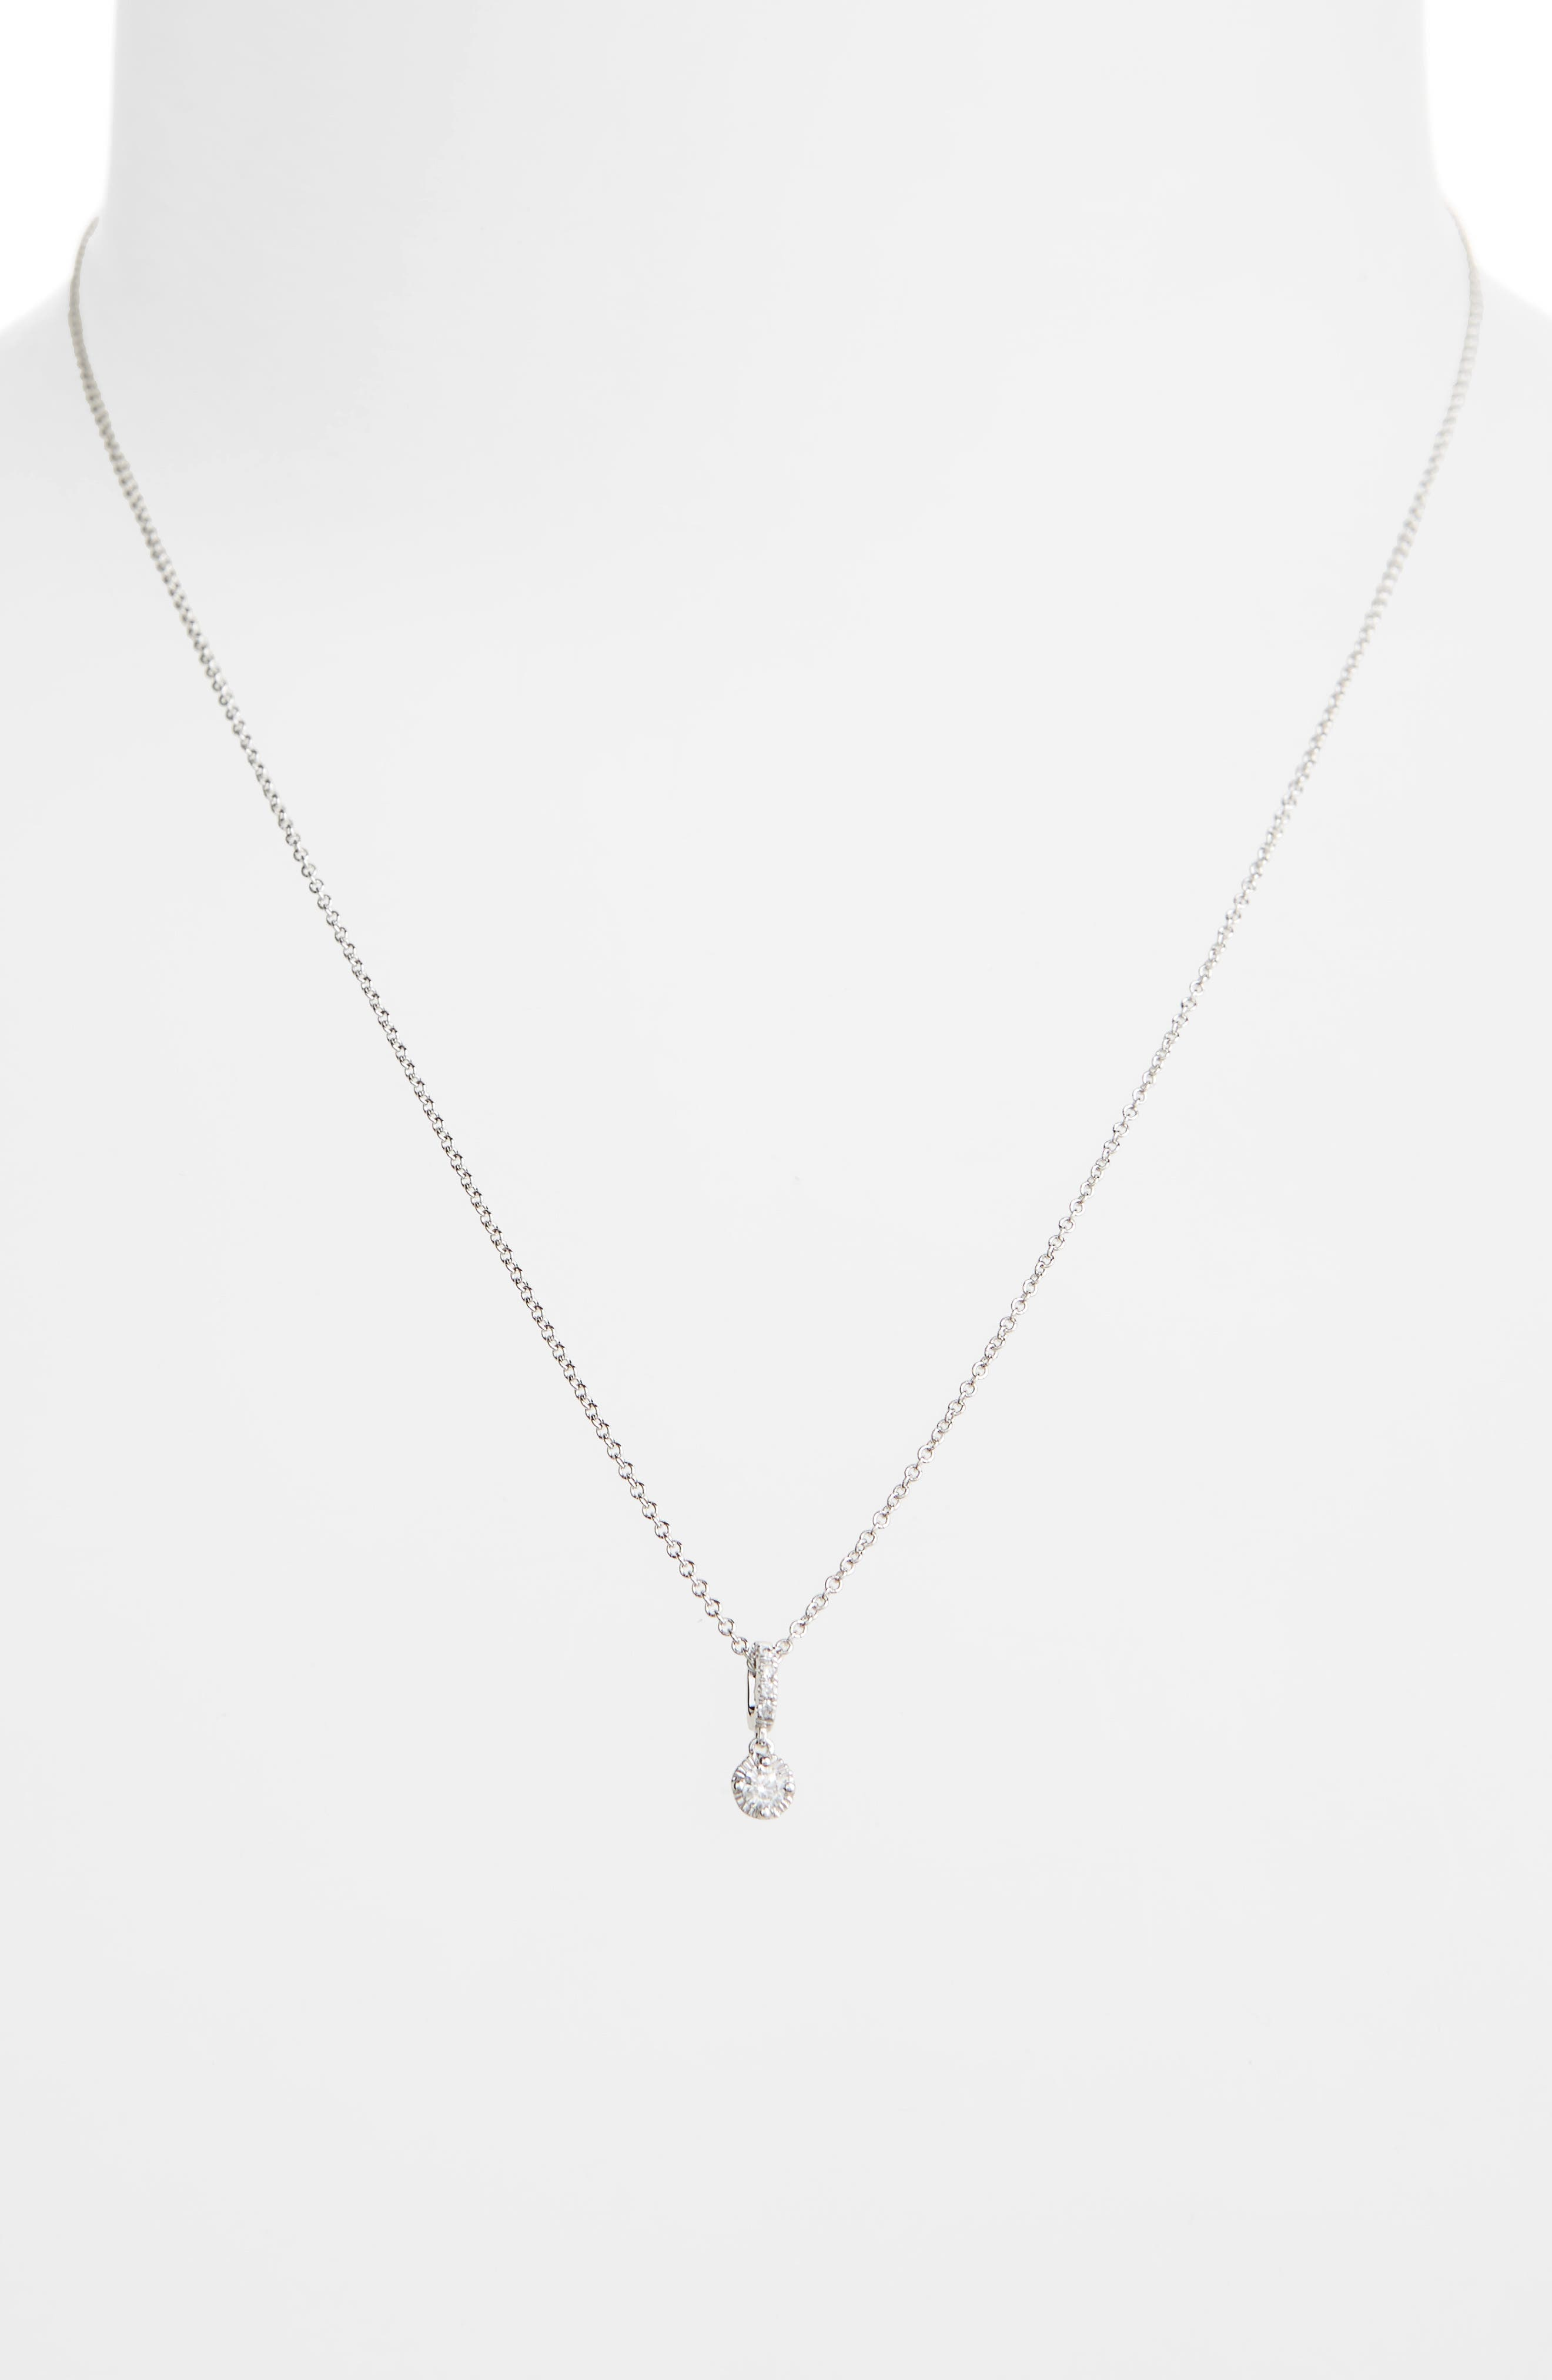 Mila Diamond Pendant Necklace,                             Alternate thumbnail 2, color,                             WHITE GOLD